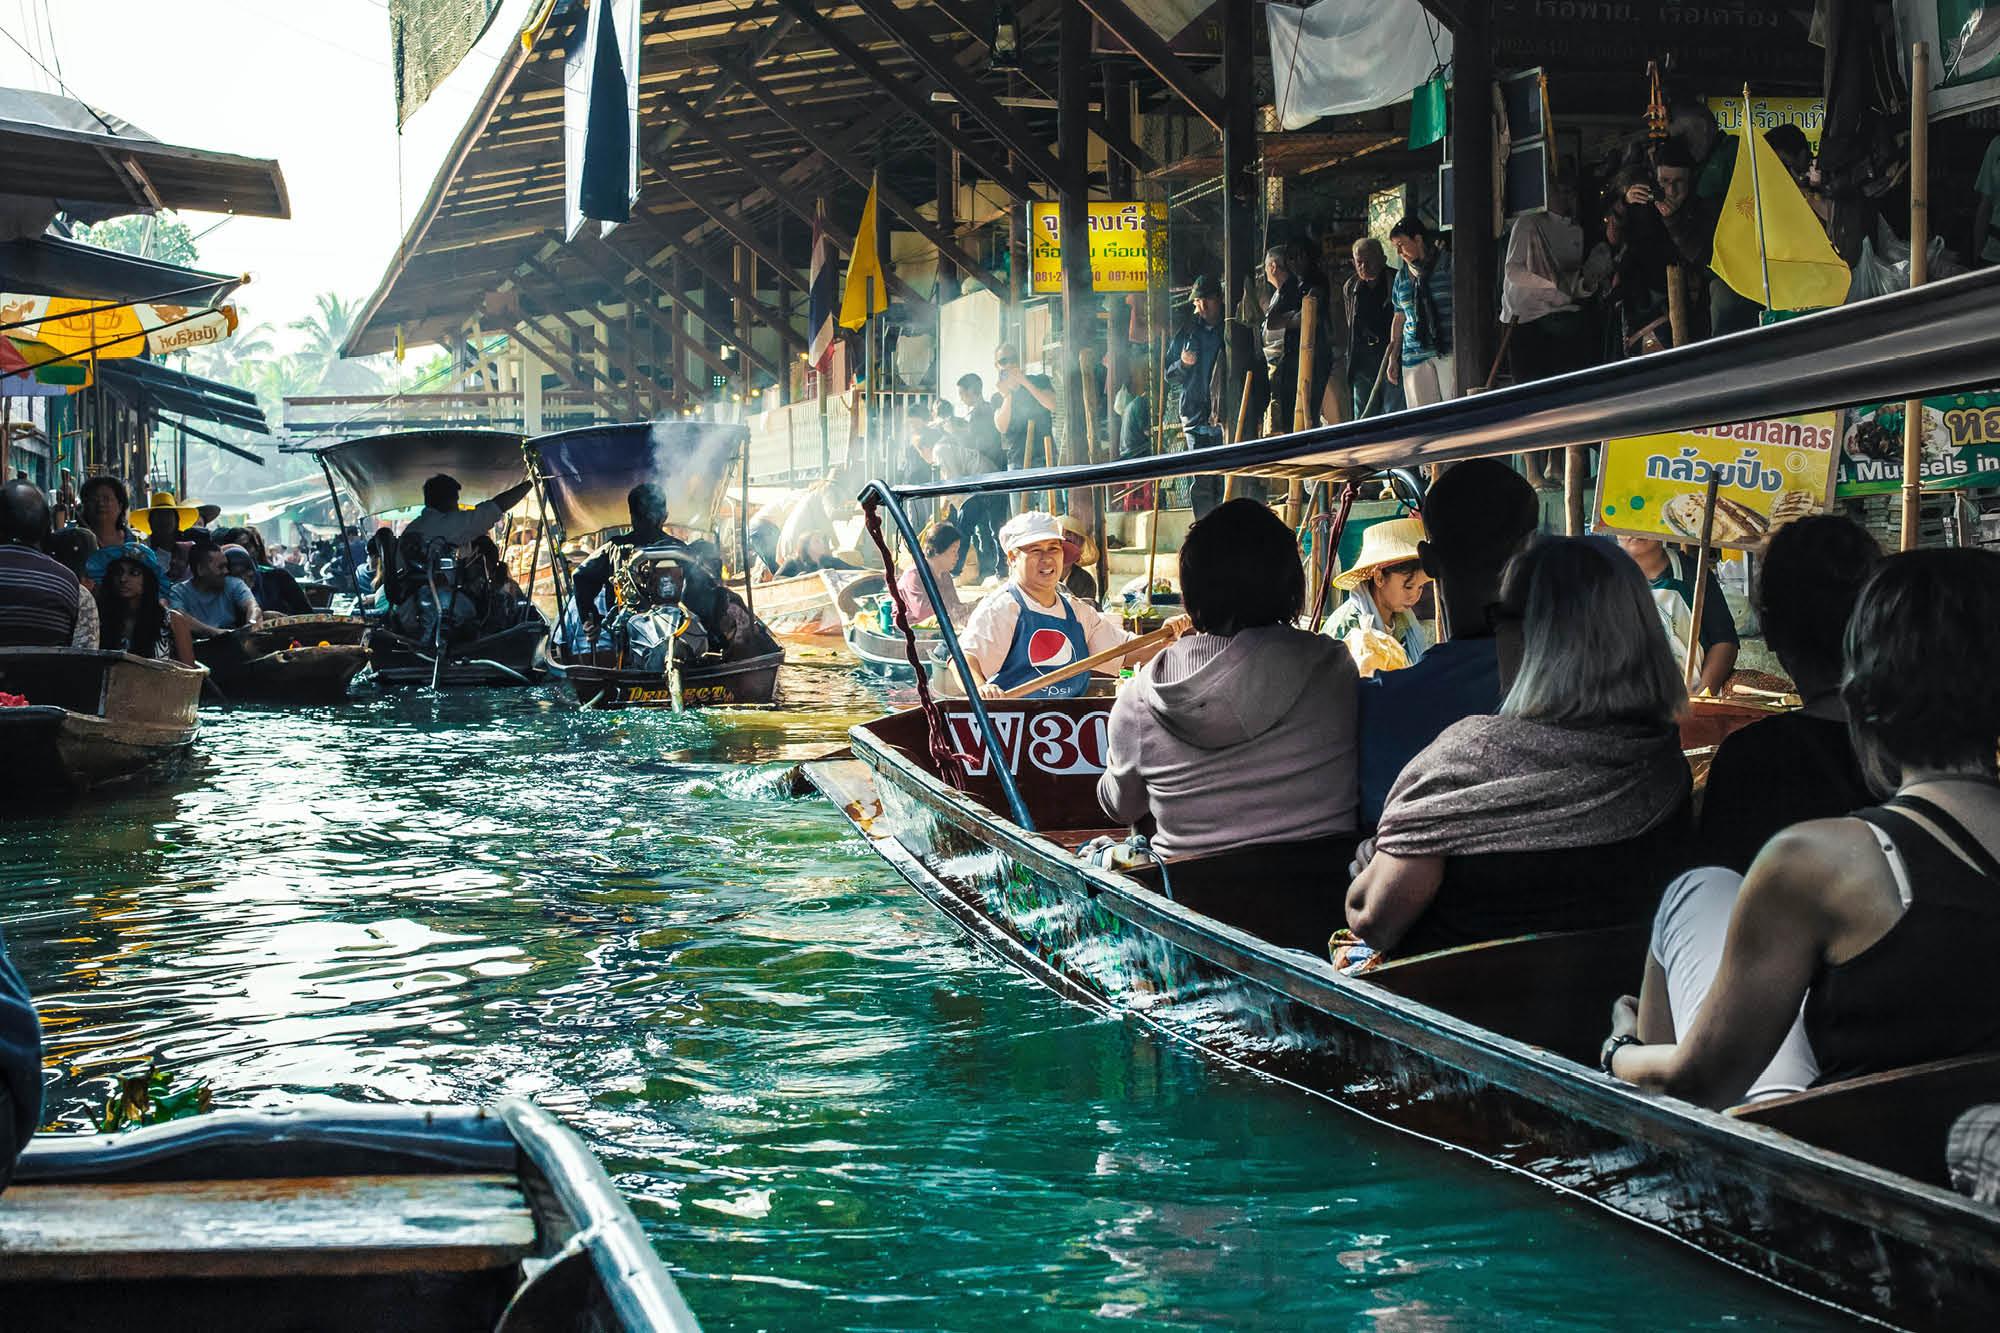 The Damnoen Saduak floating market is a more authentic floating marketing